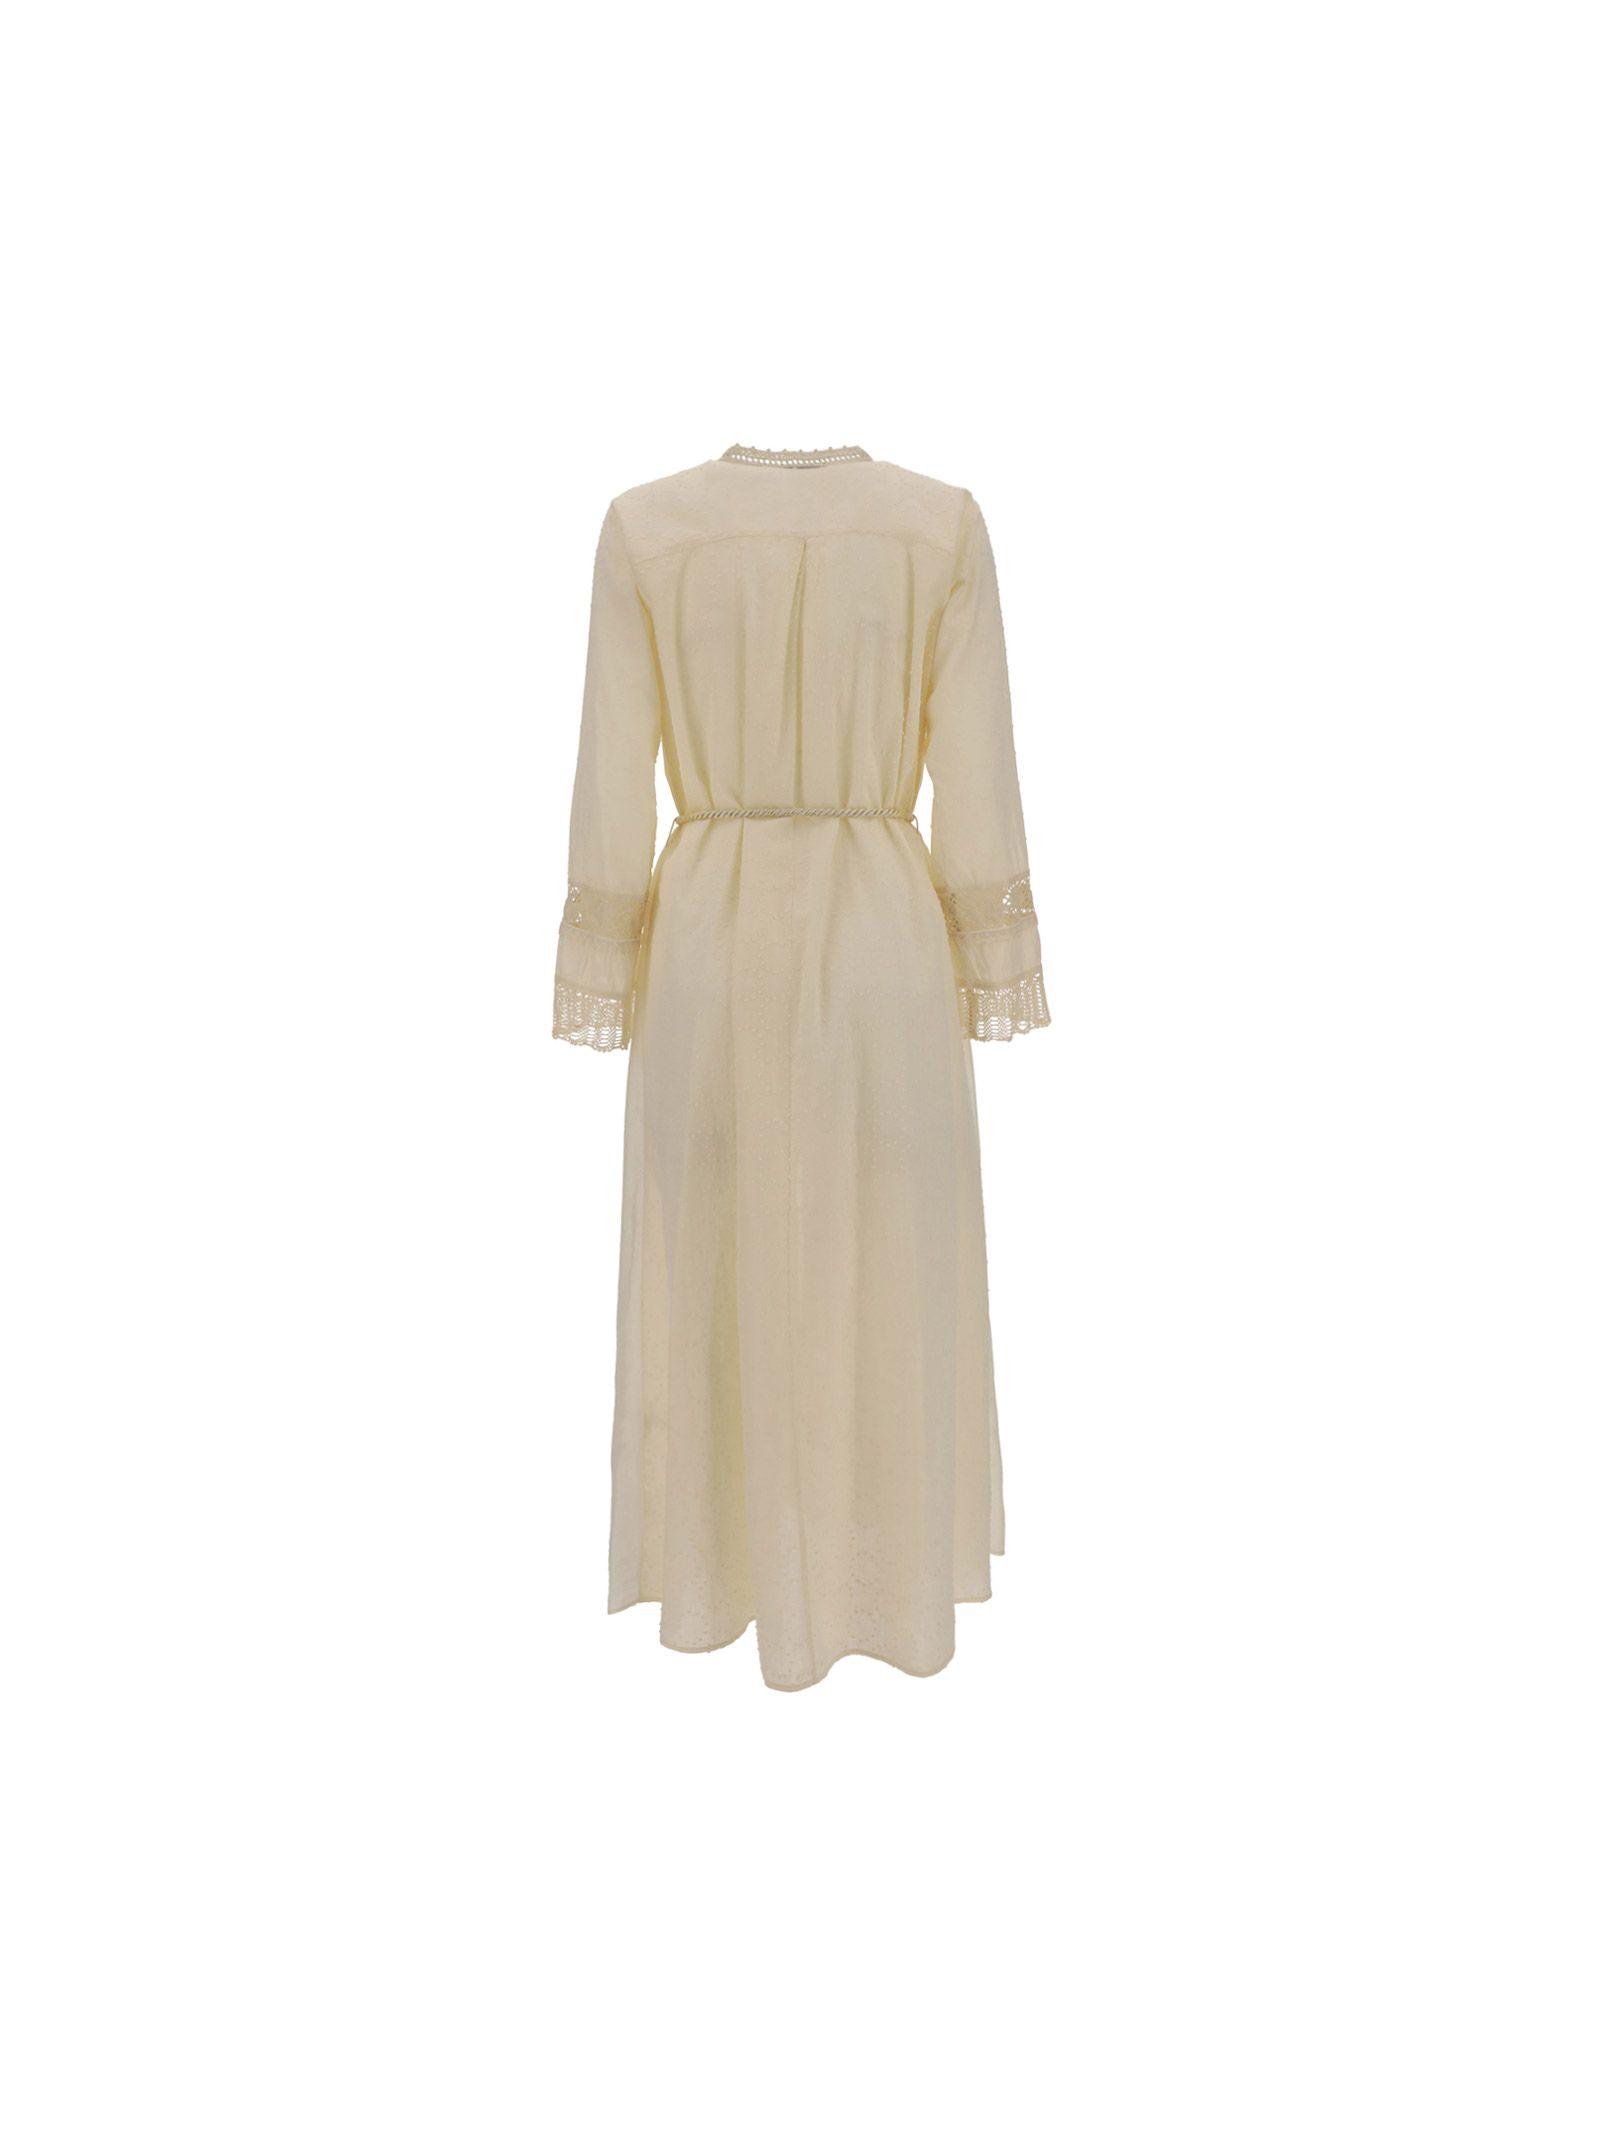 FORTE FORTE Midi dresses FORTE FORTE WOMEN'S BEIGE OTHER MATERIALS DRESS